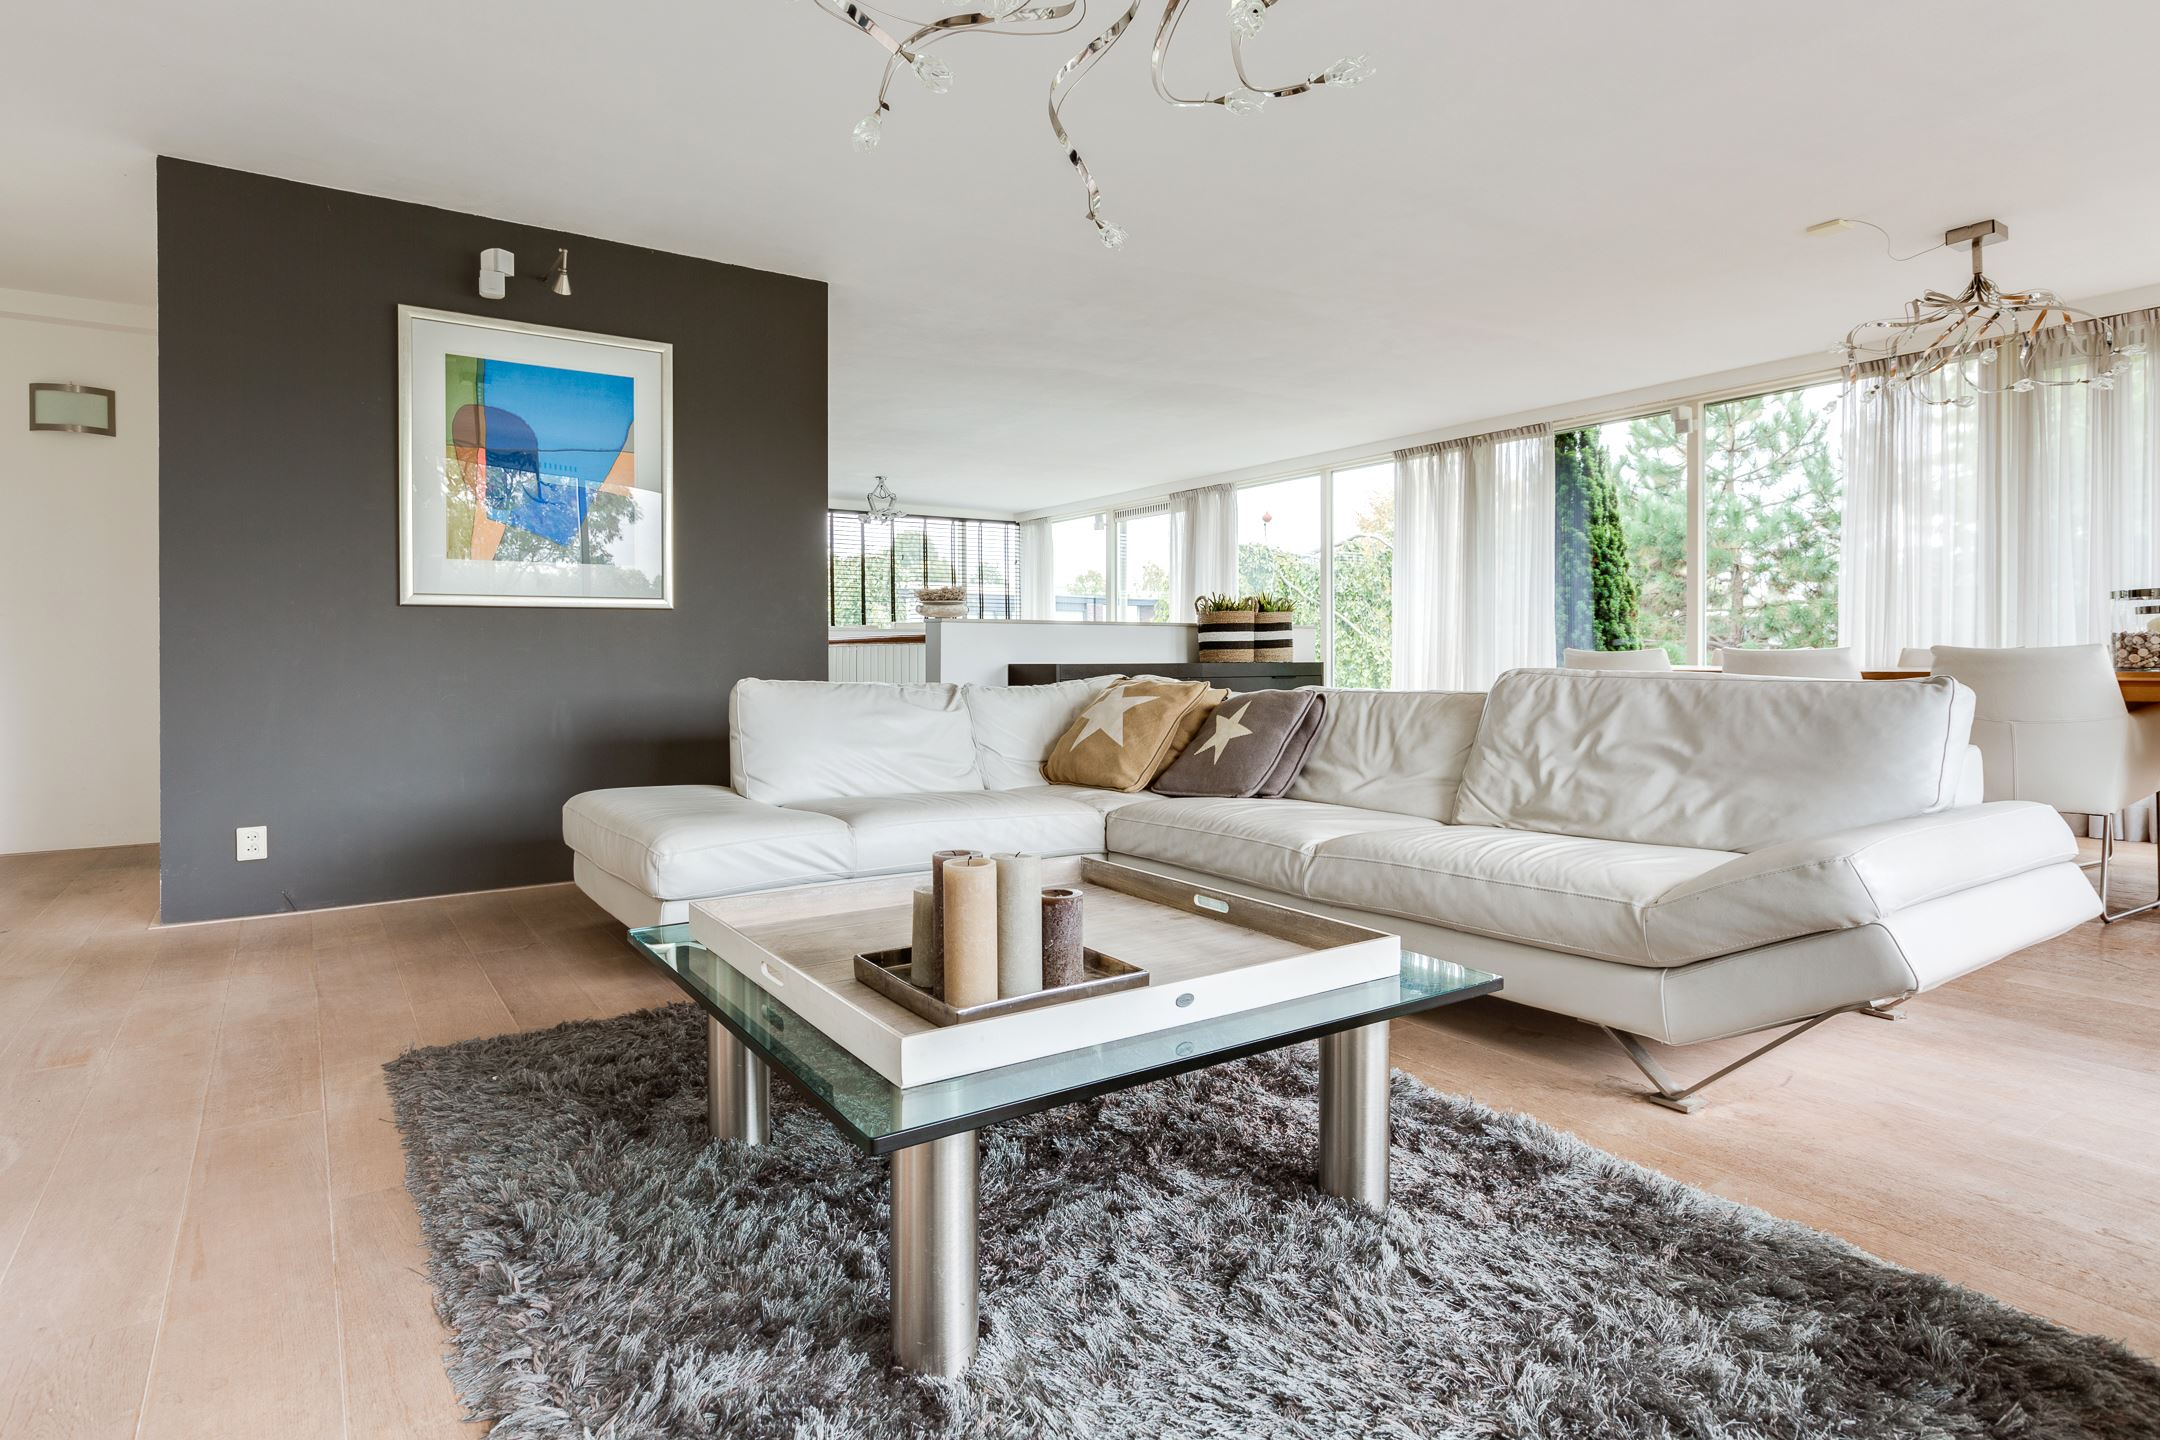 Huis te koop: aletta jacobskade 127 3137 tj vlaardingen [funda]